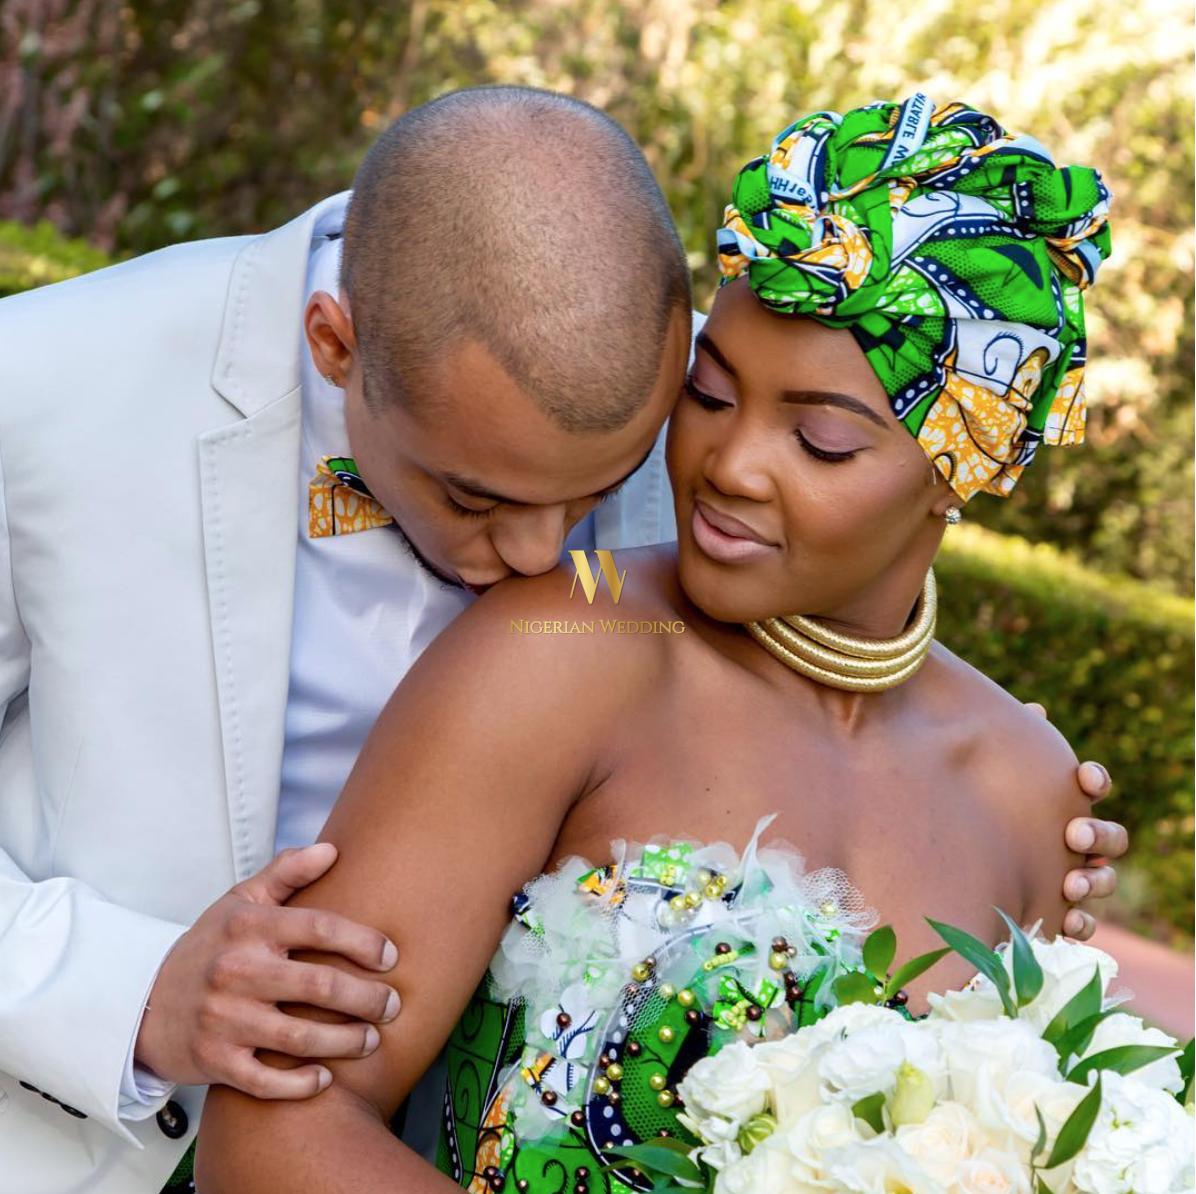 South African Zulu Bride Nosipho Miya & Her Groom, Demetrius Leiva ...